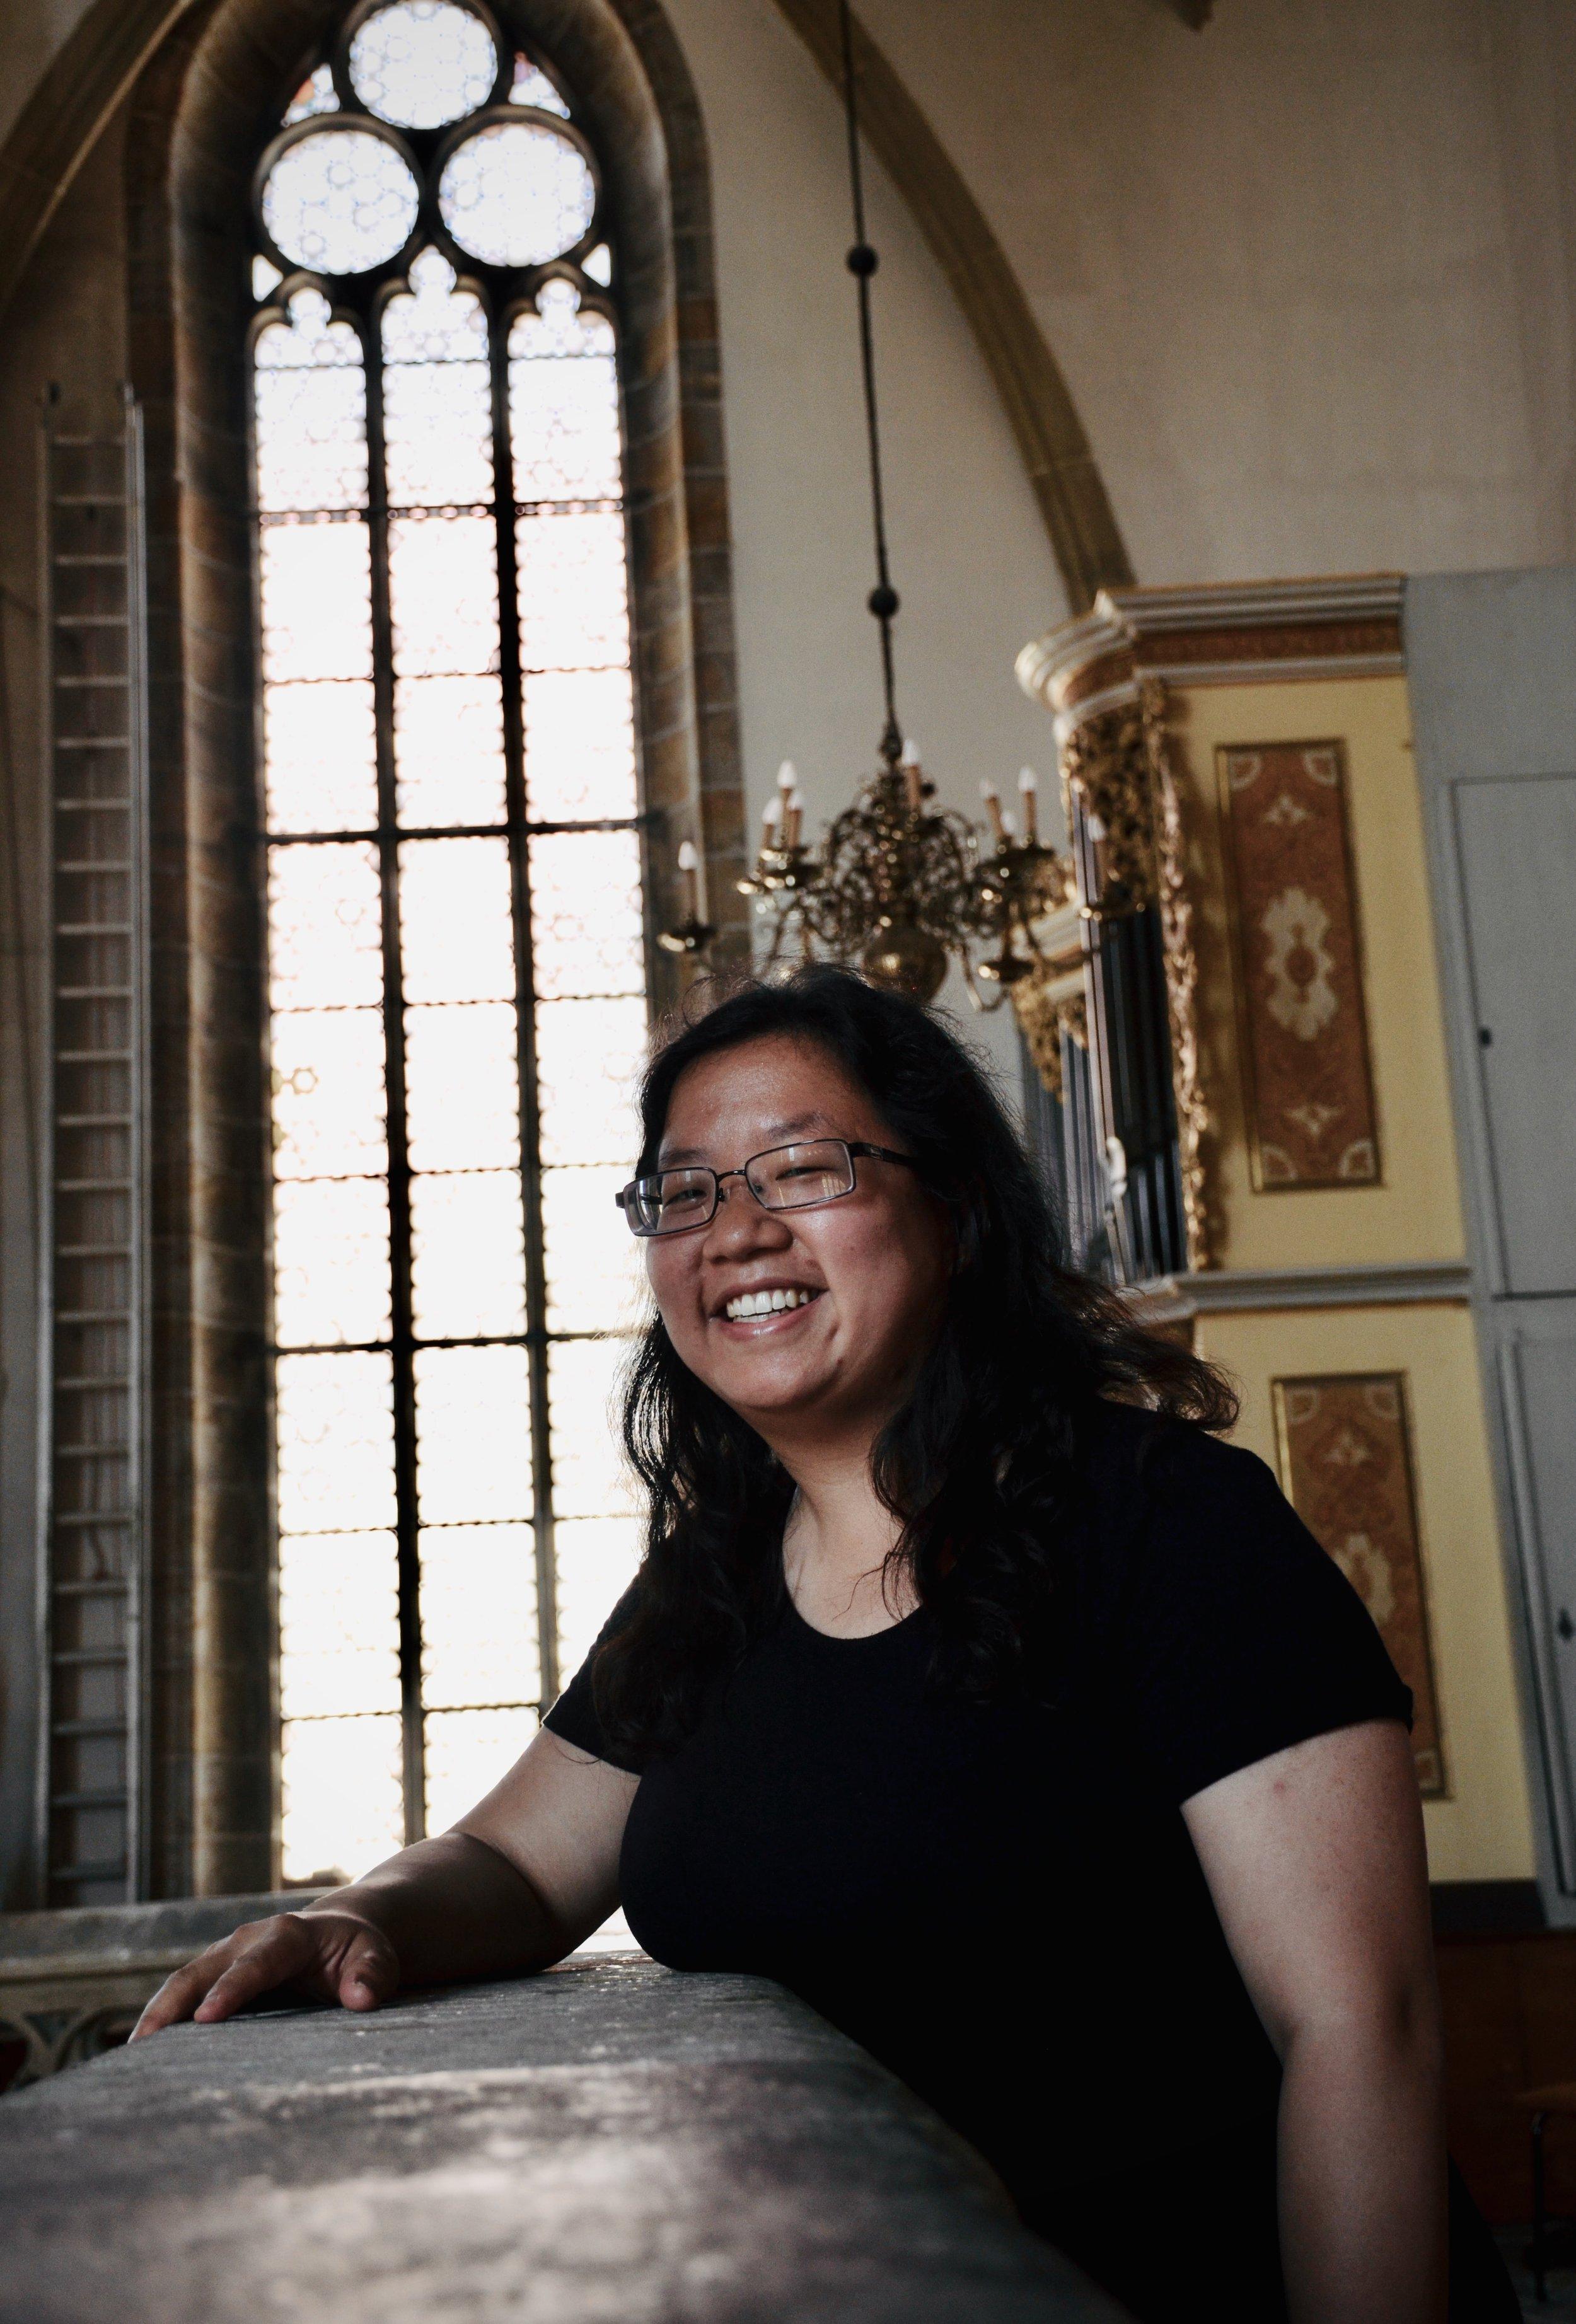 Jennifer Hsiao listens to the 1714 Gottfried Silbermann organ in Freiberg Dom.